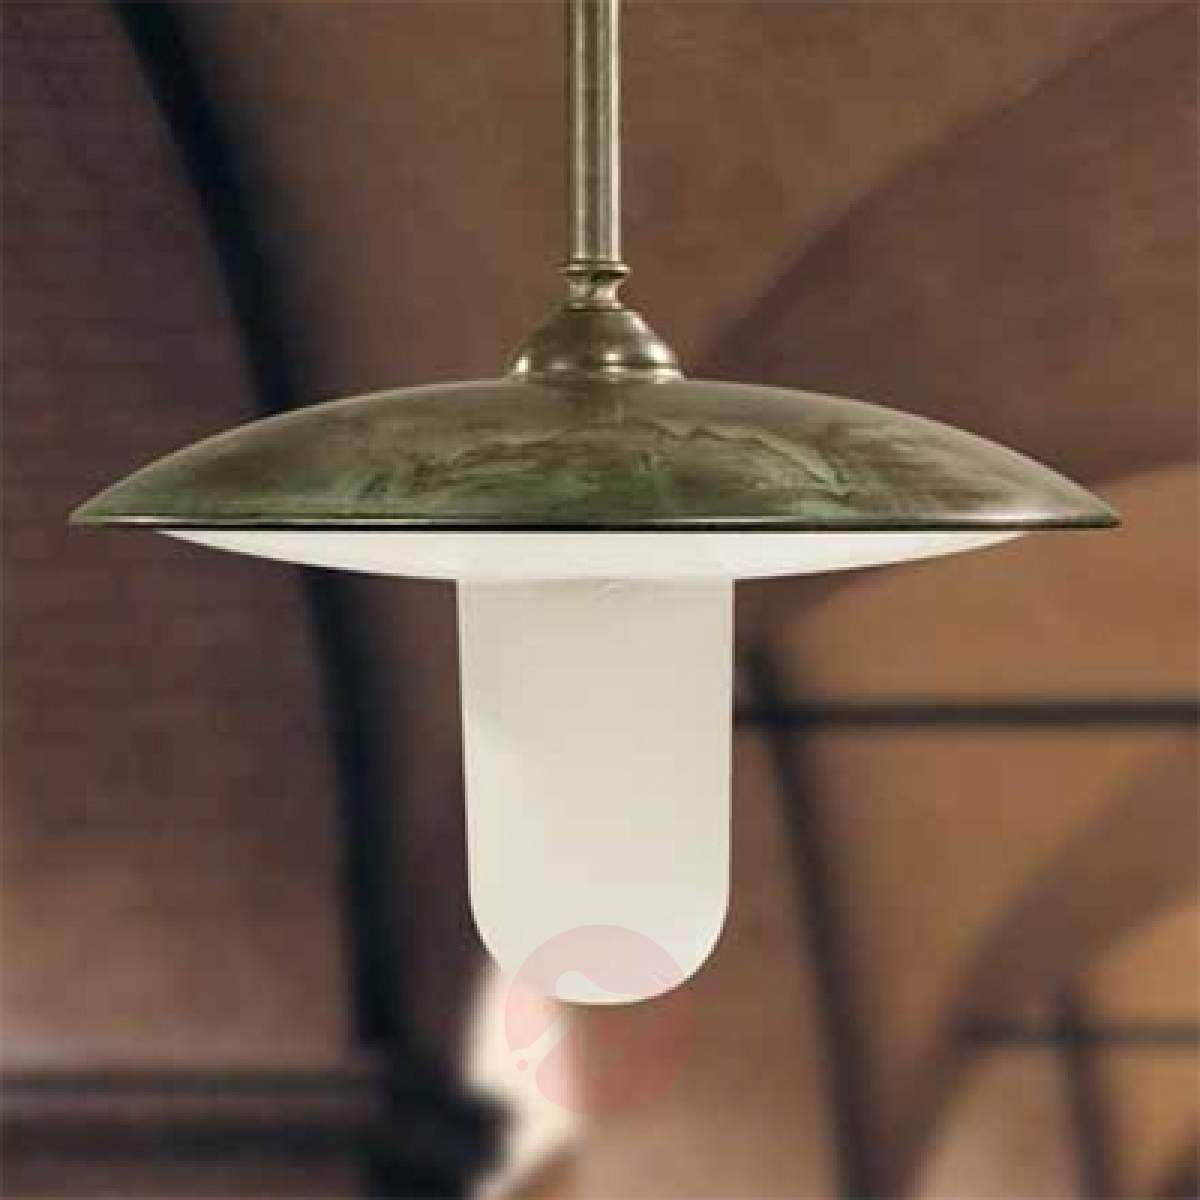 Oswietlenie Led Leroy Merlin Lampy Zewnetrzne Sufitowe Stylowe Lampy Ogrodowe Lampa Ogrodowa Philips Robin Lampa Zewnetrzna Lamp Inspiration Home Decor